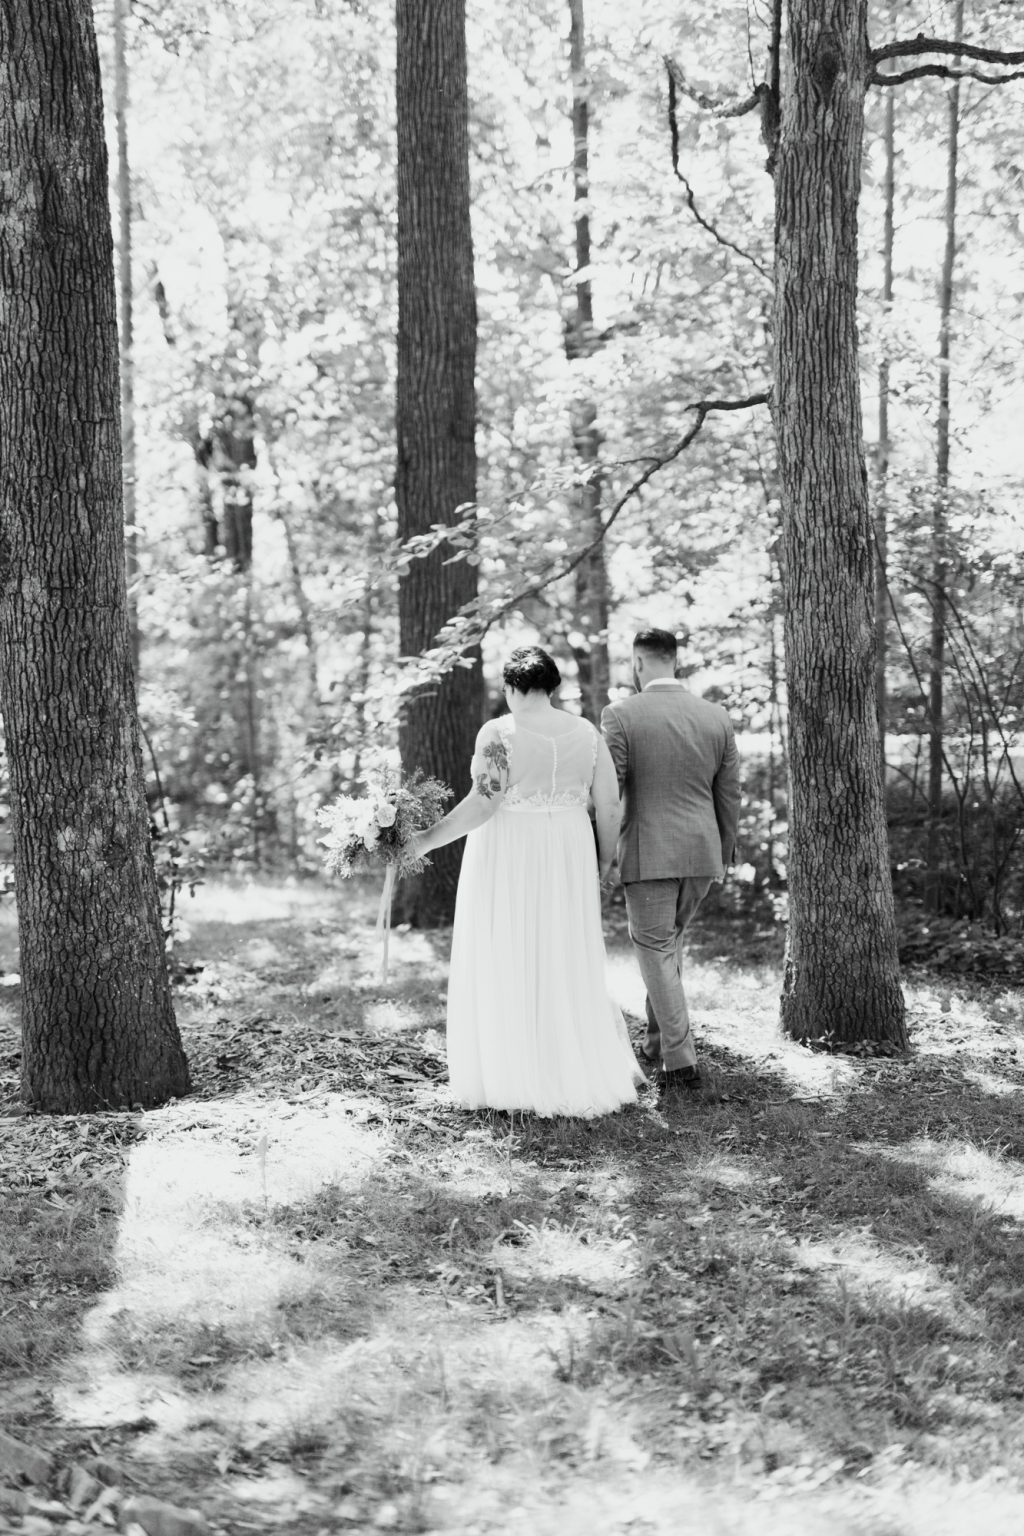 haley-richter-photo-west-chester-summer-wedding-boxcar-brewery-092